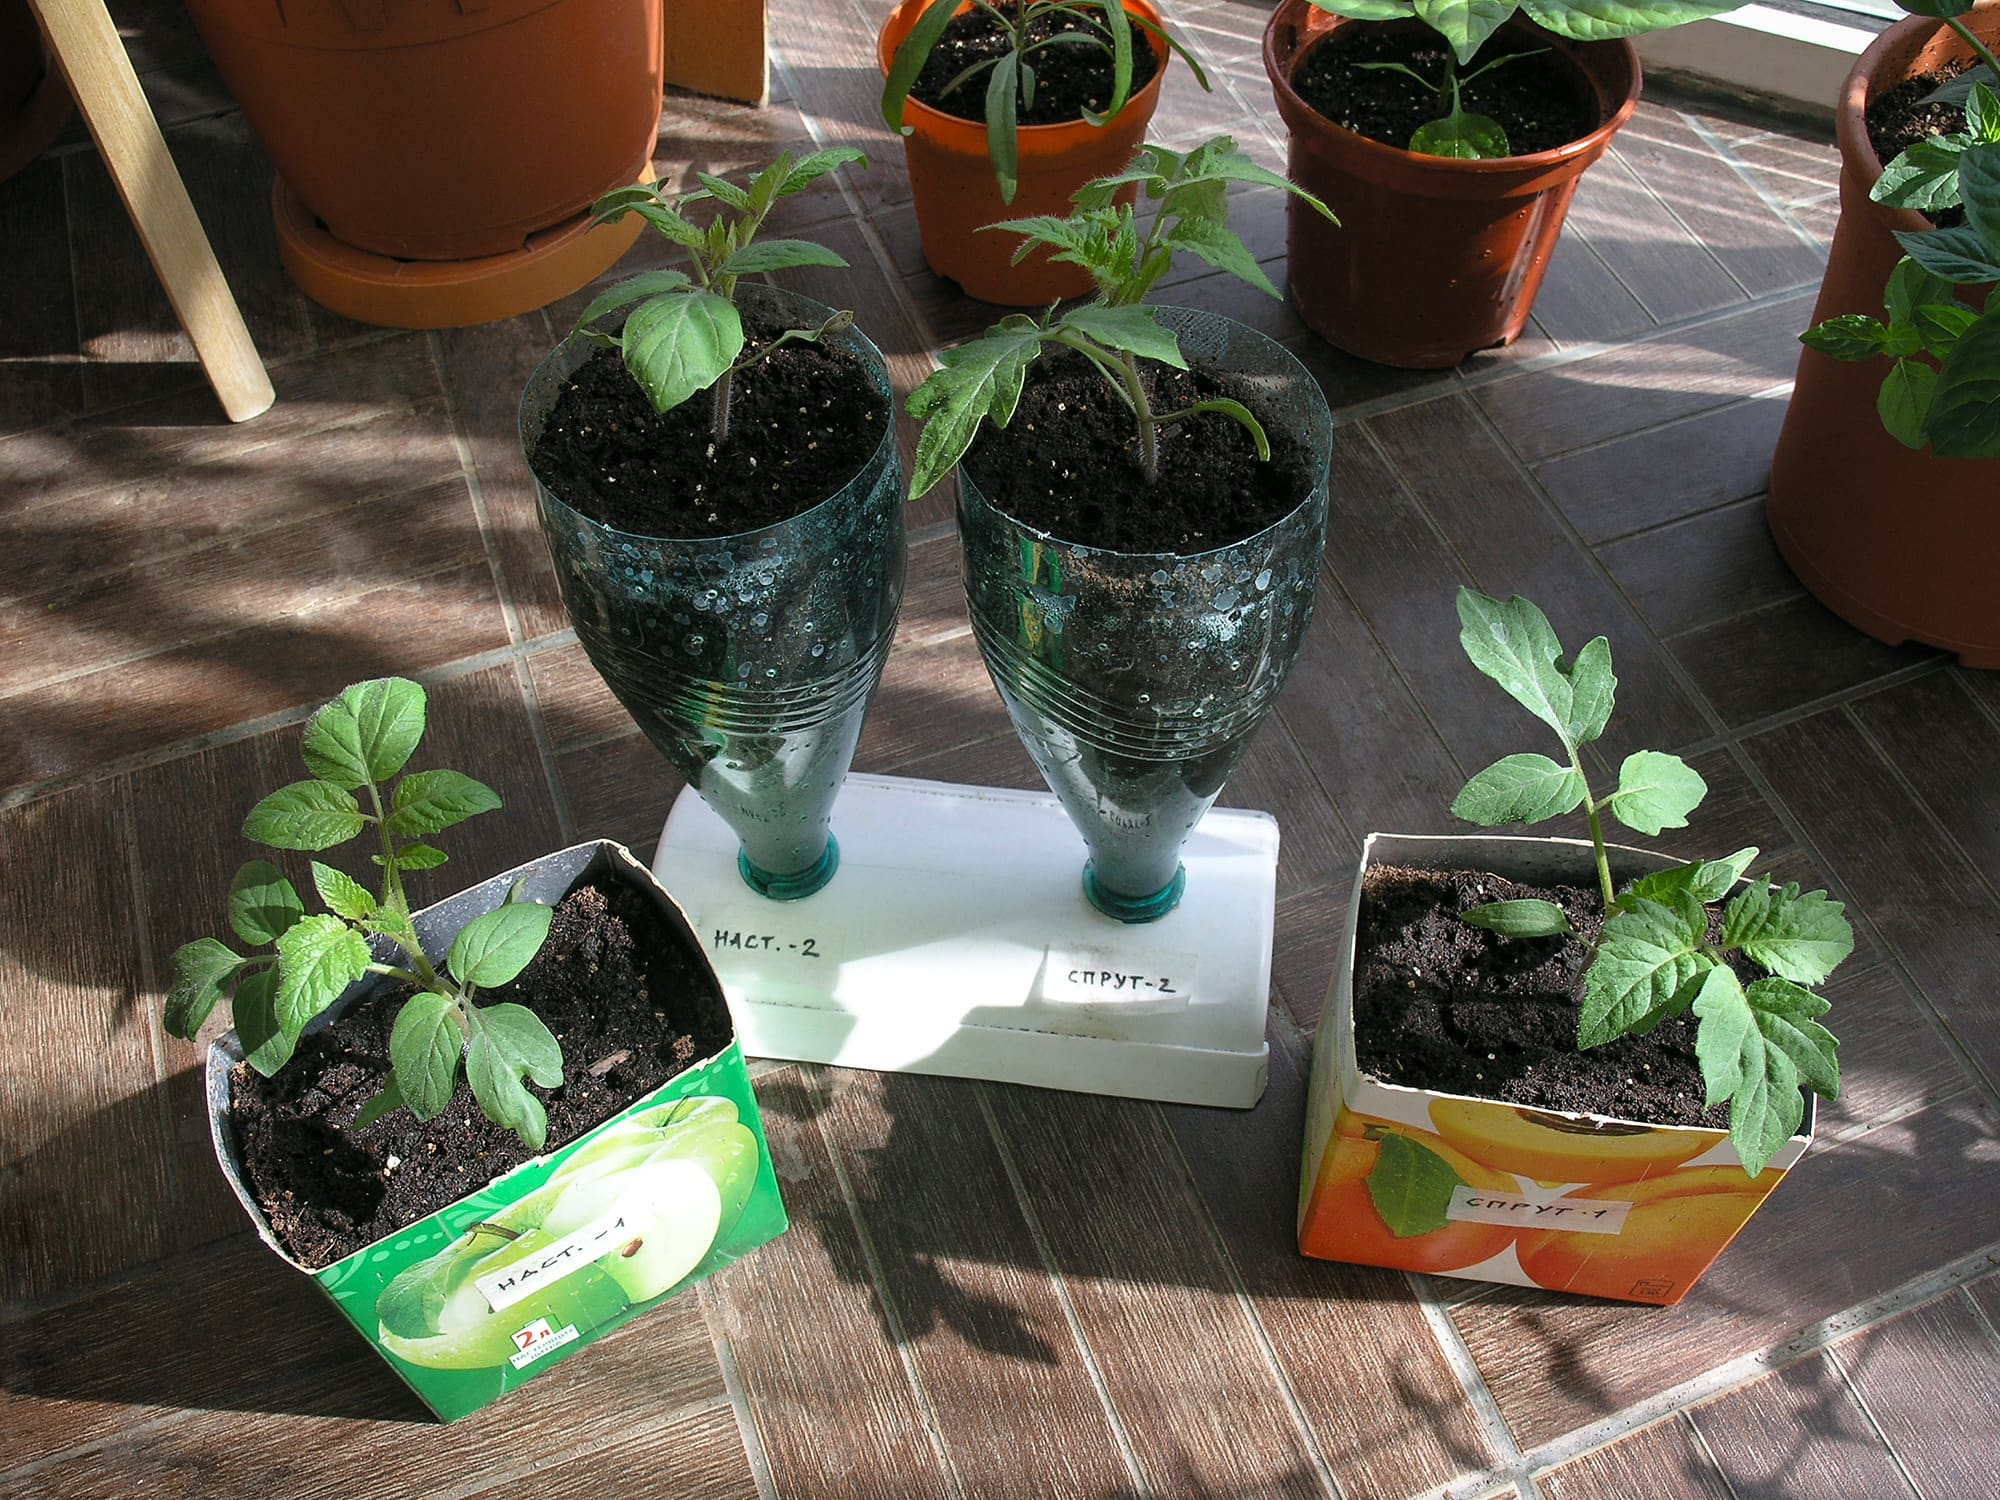 Саженцы помидоров на старте эксперимента